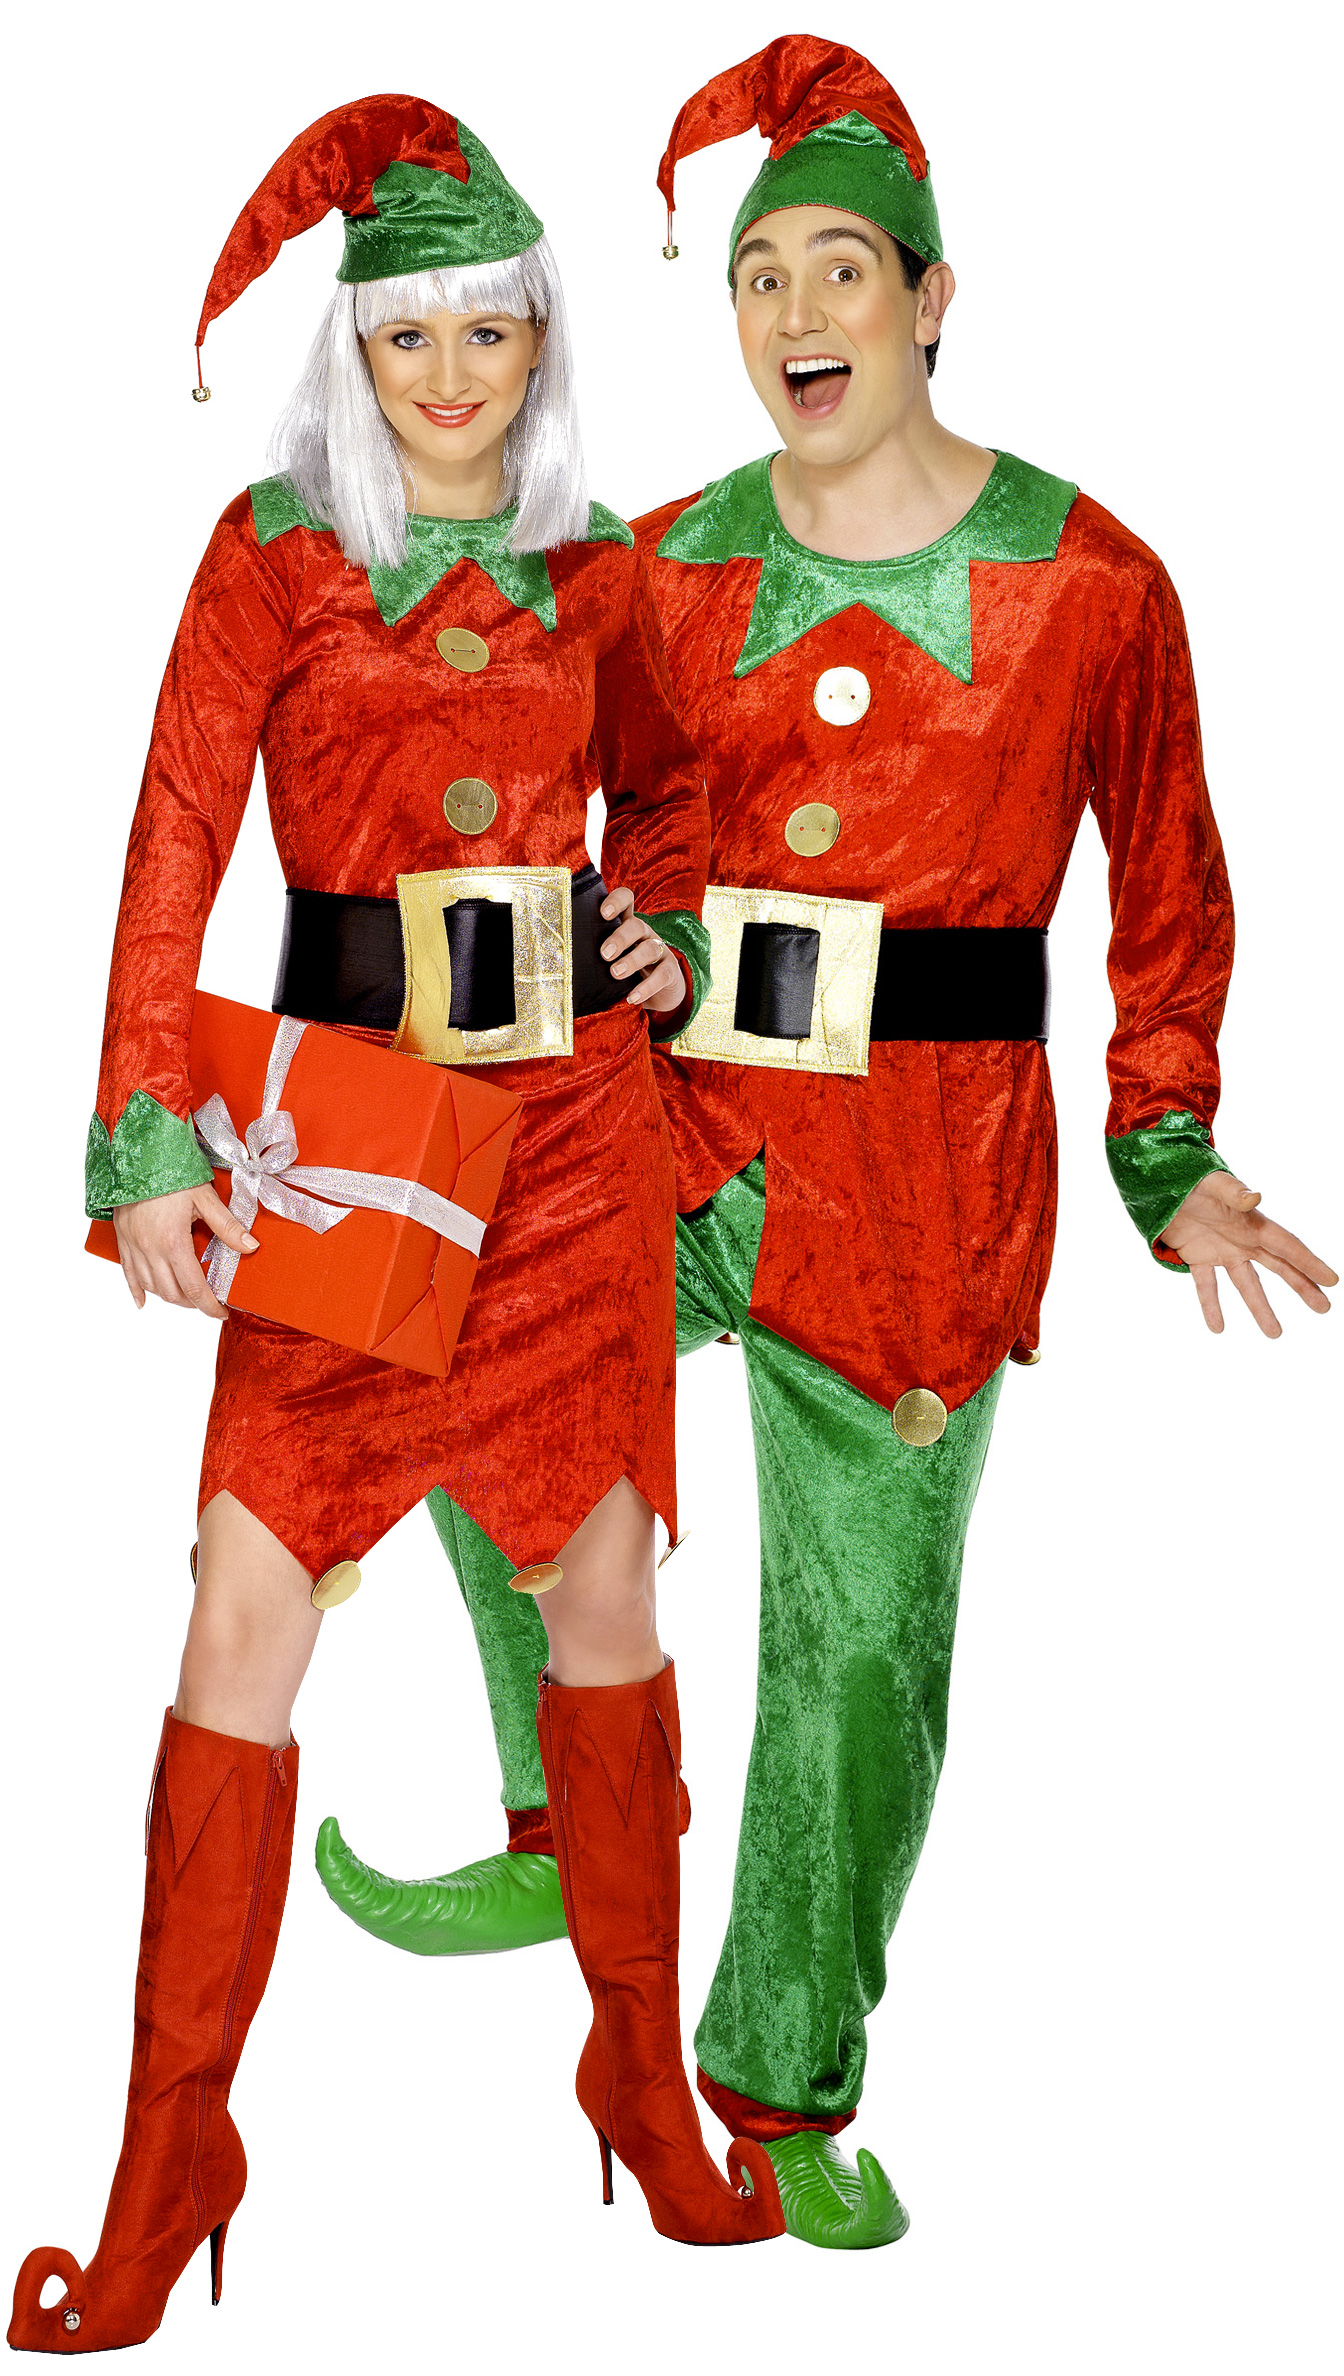 Disfraz de pareja de duendes de Navidad: Disfraces parejas